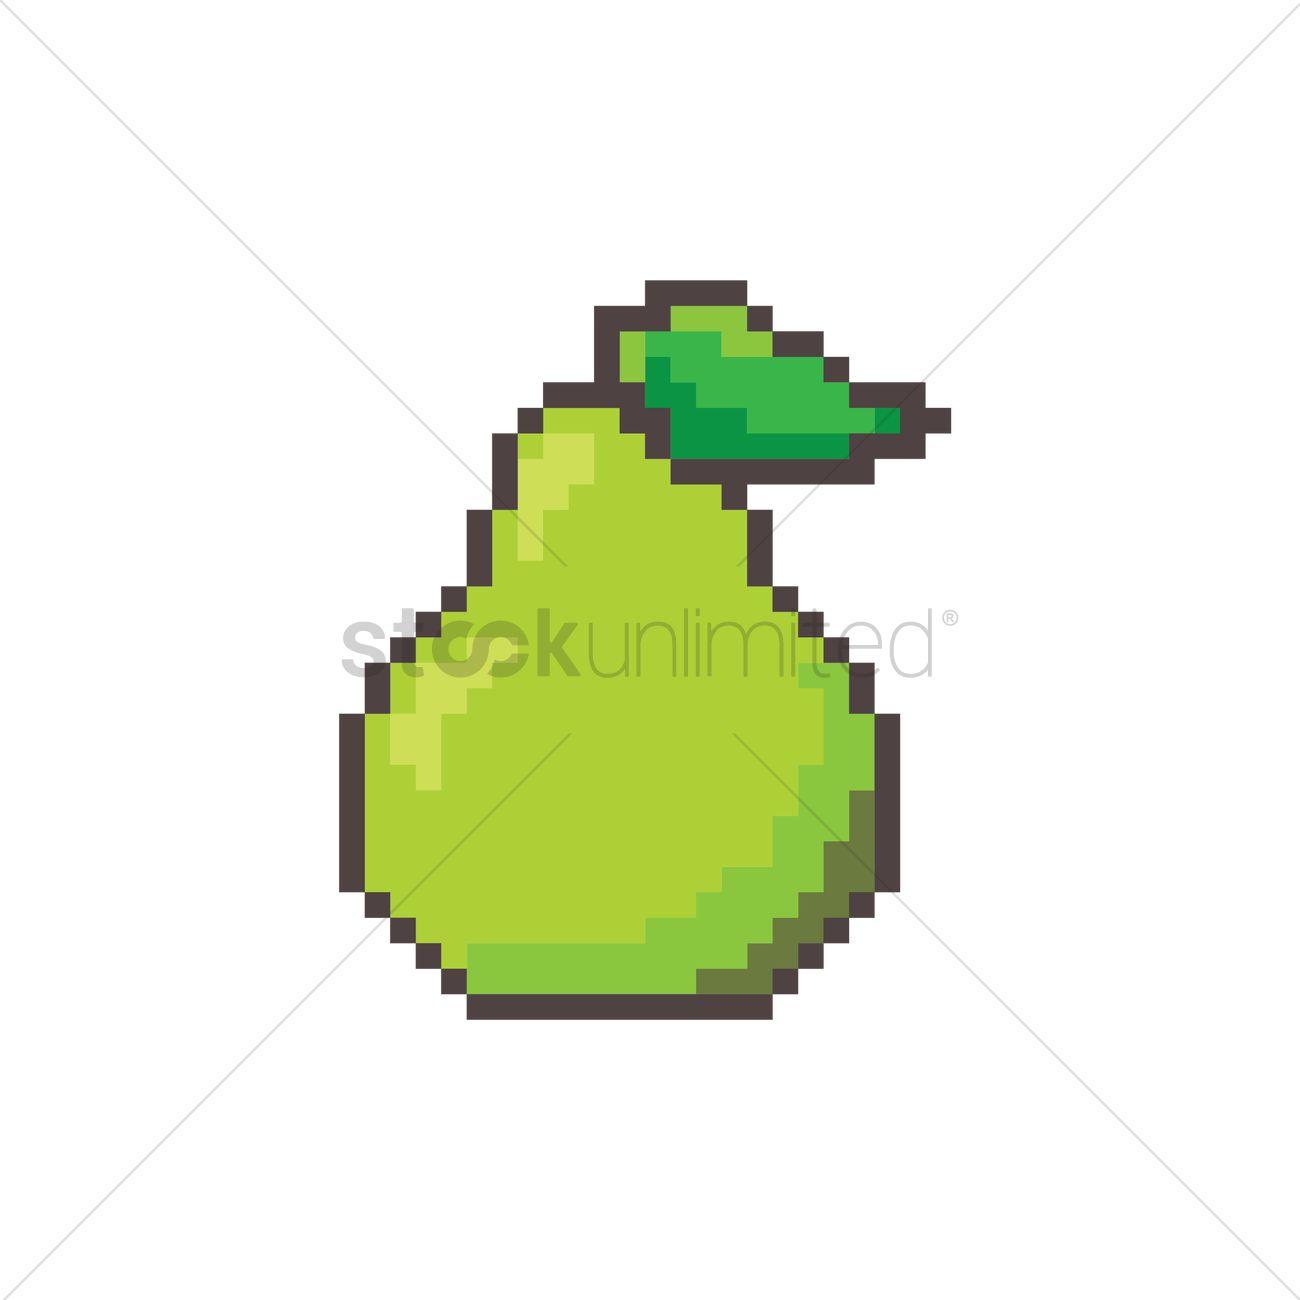 Pixel Art Pear Vector Image 1957703 Stockunlimited